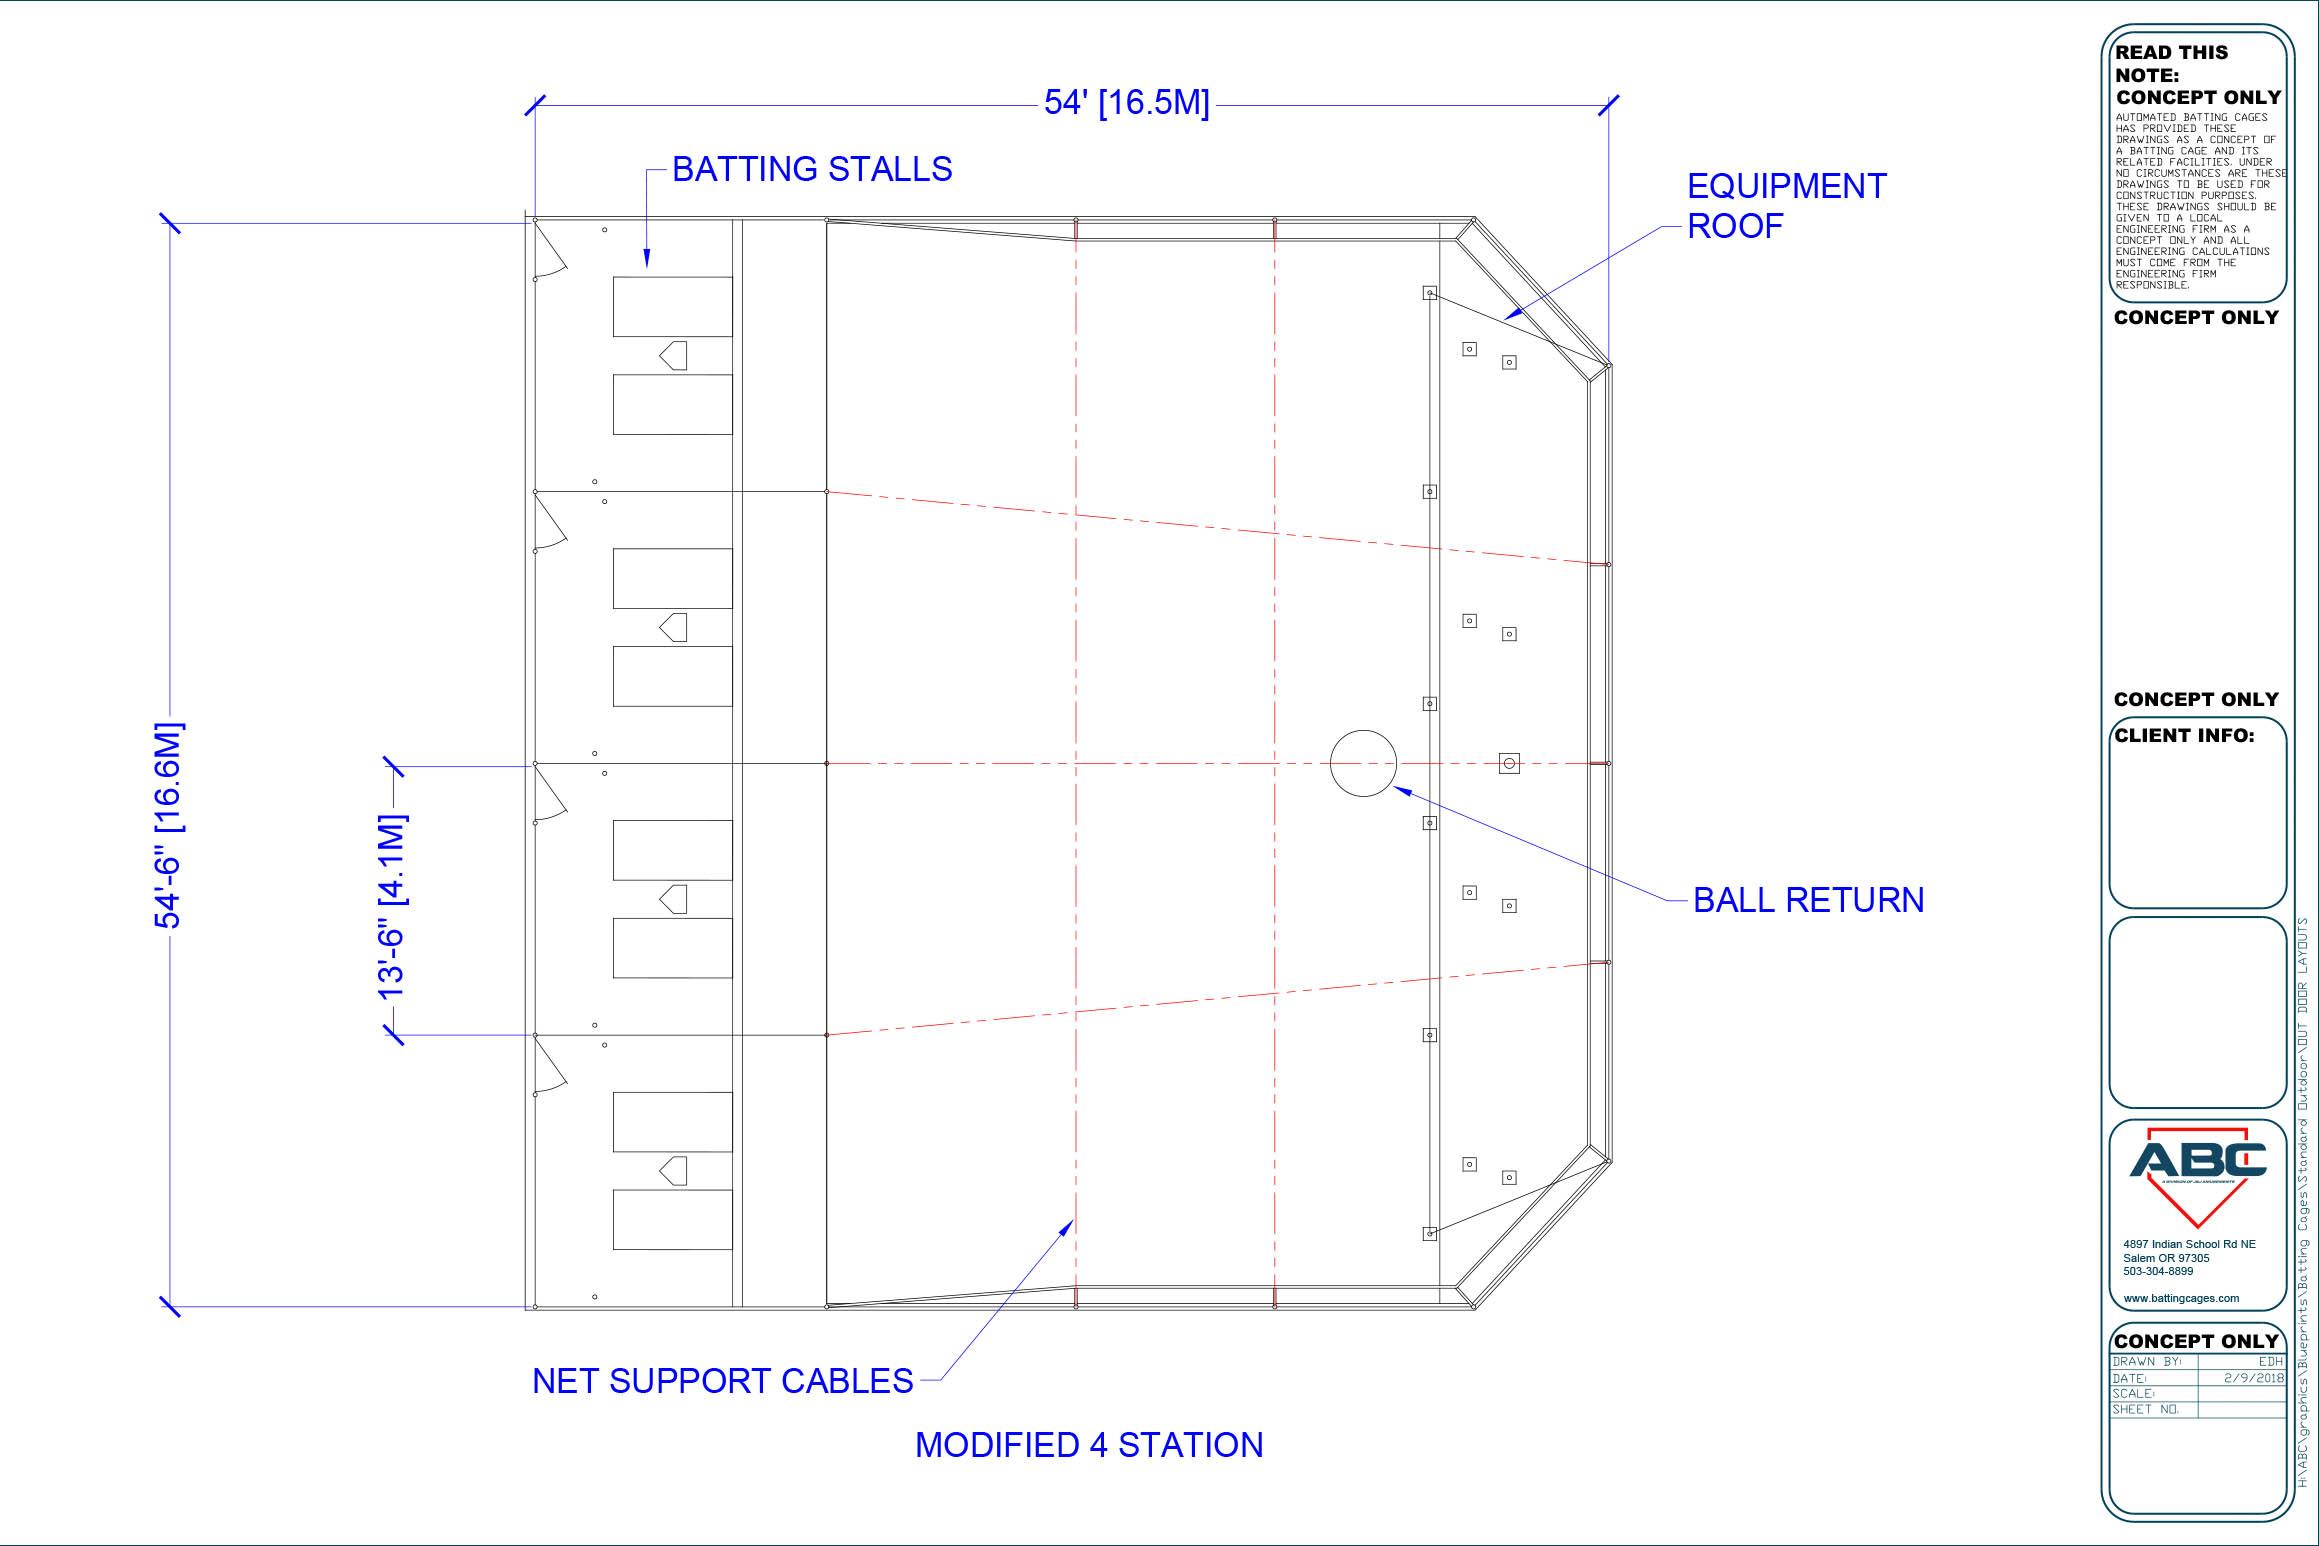 ABC modified 4 station blueprint